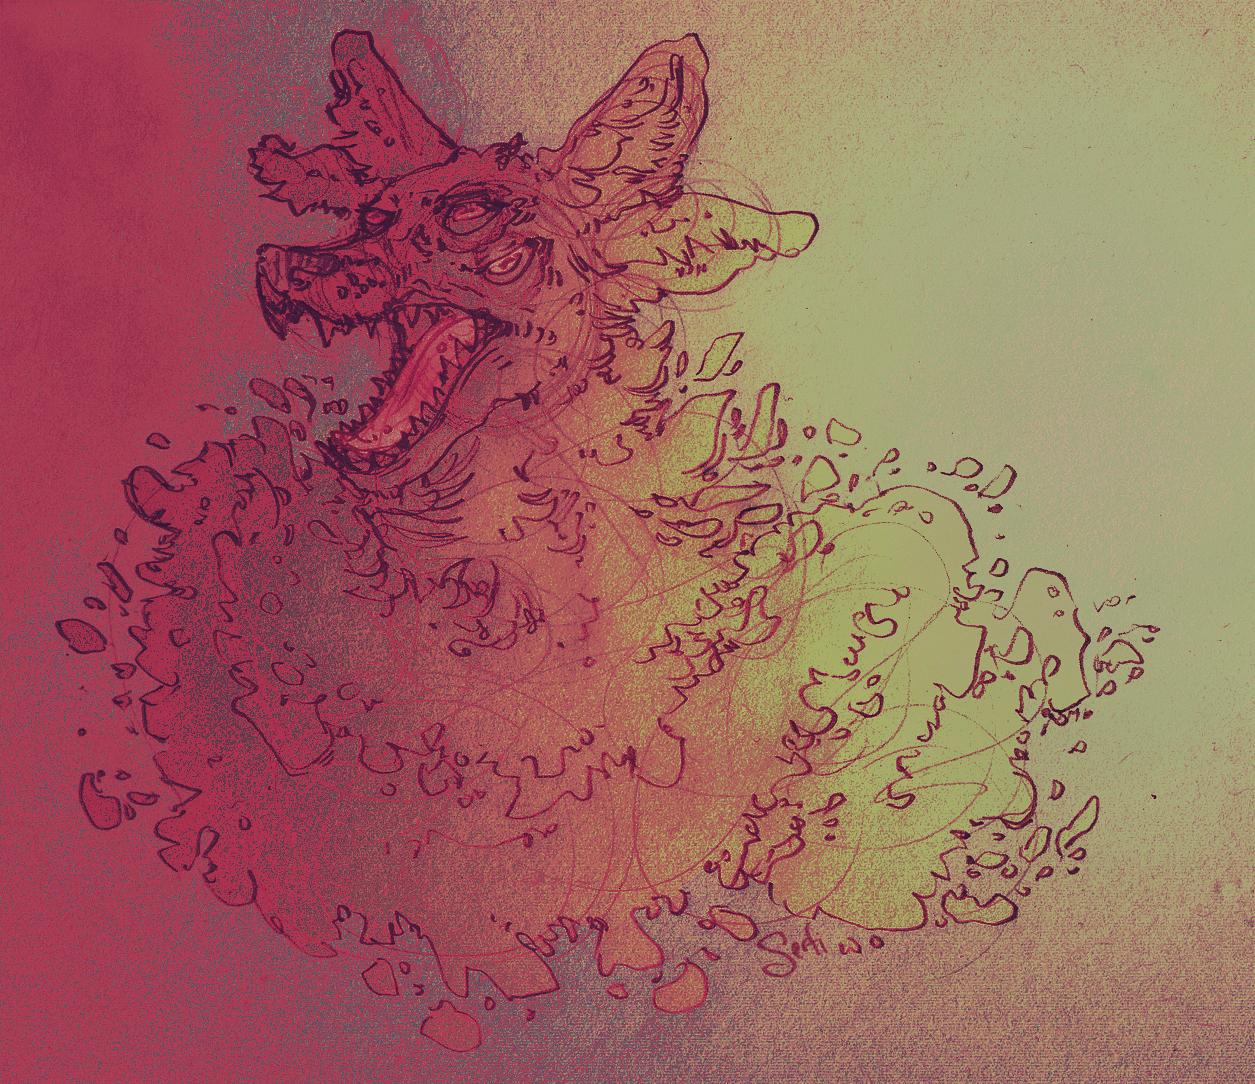 Cathrexply